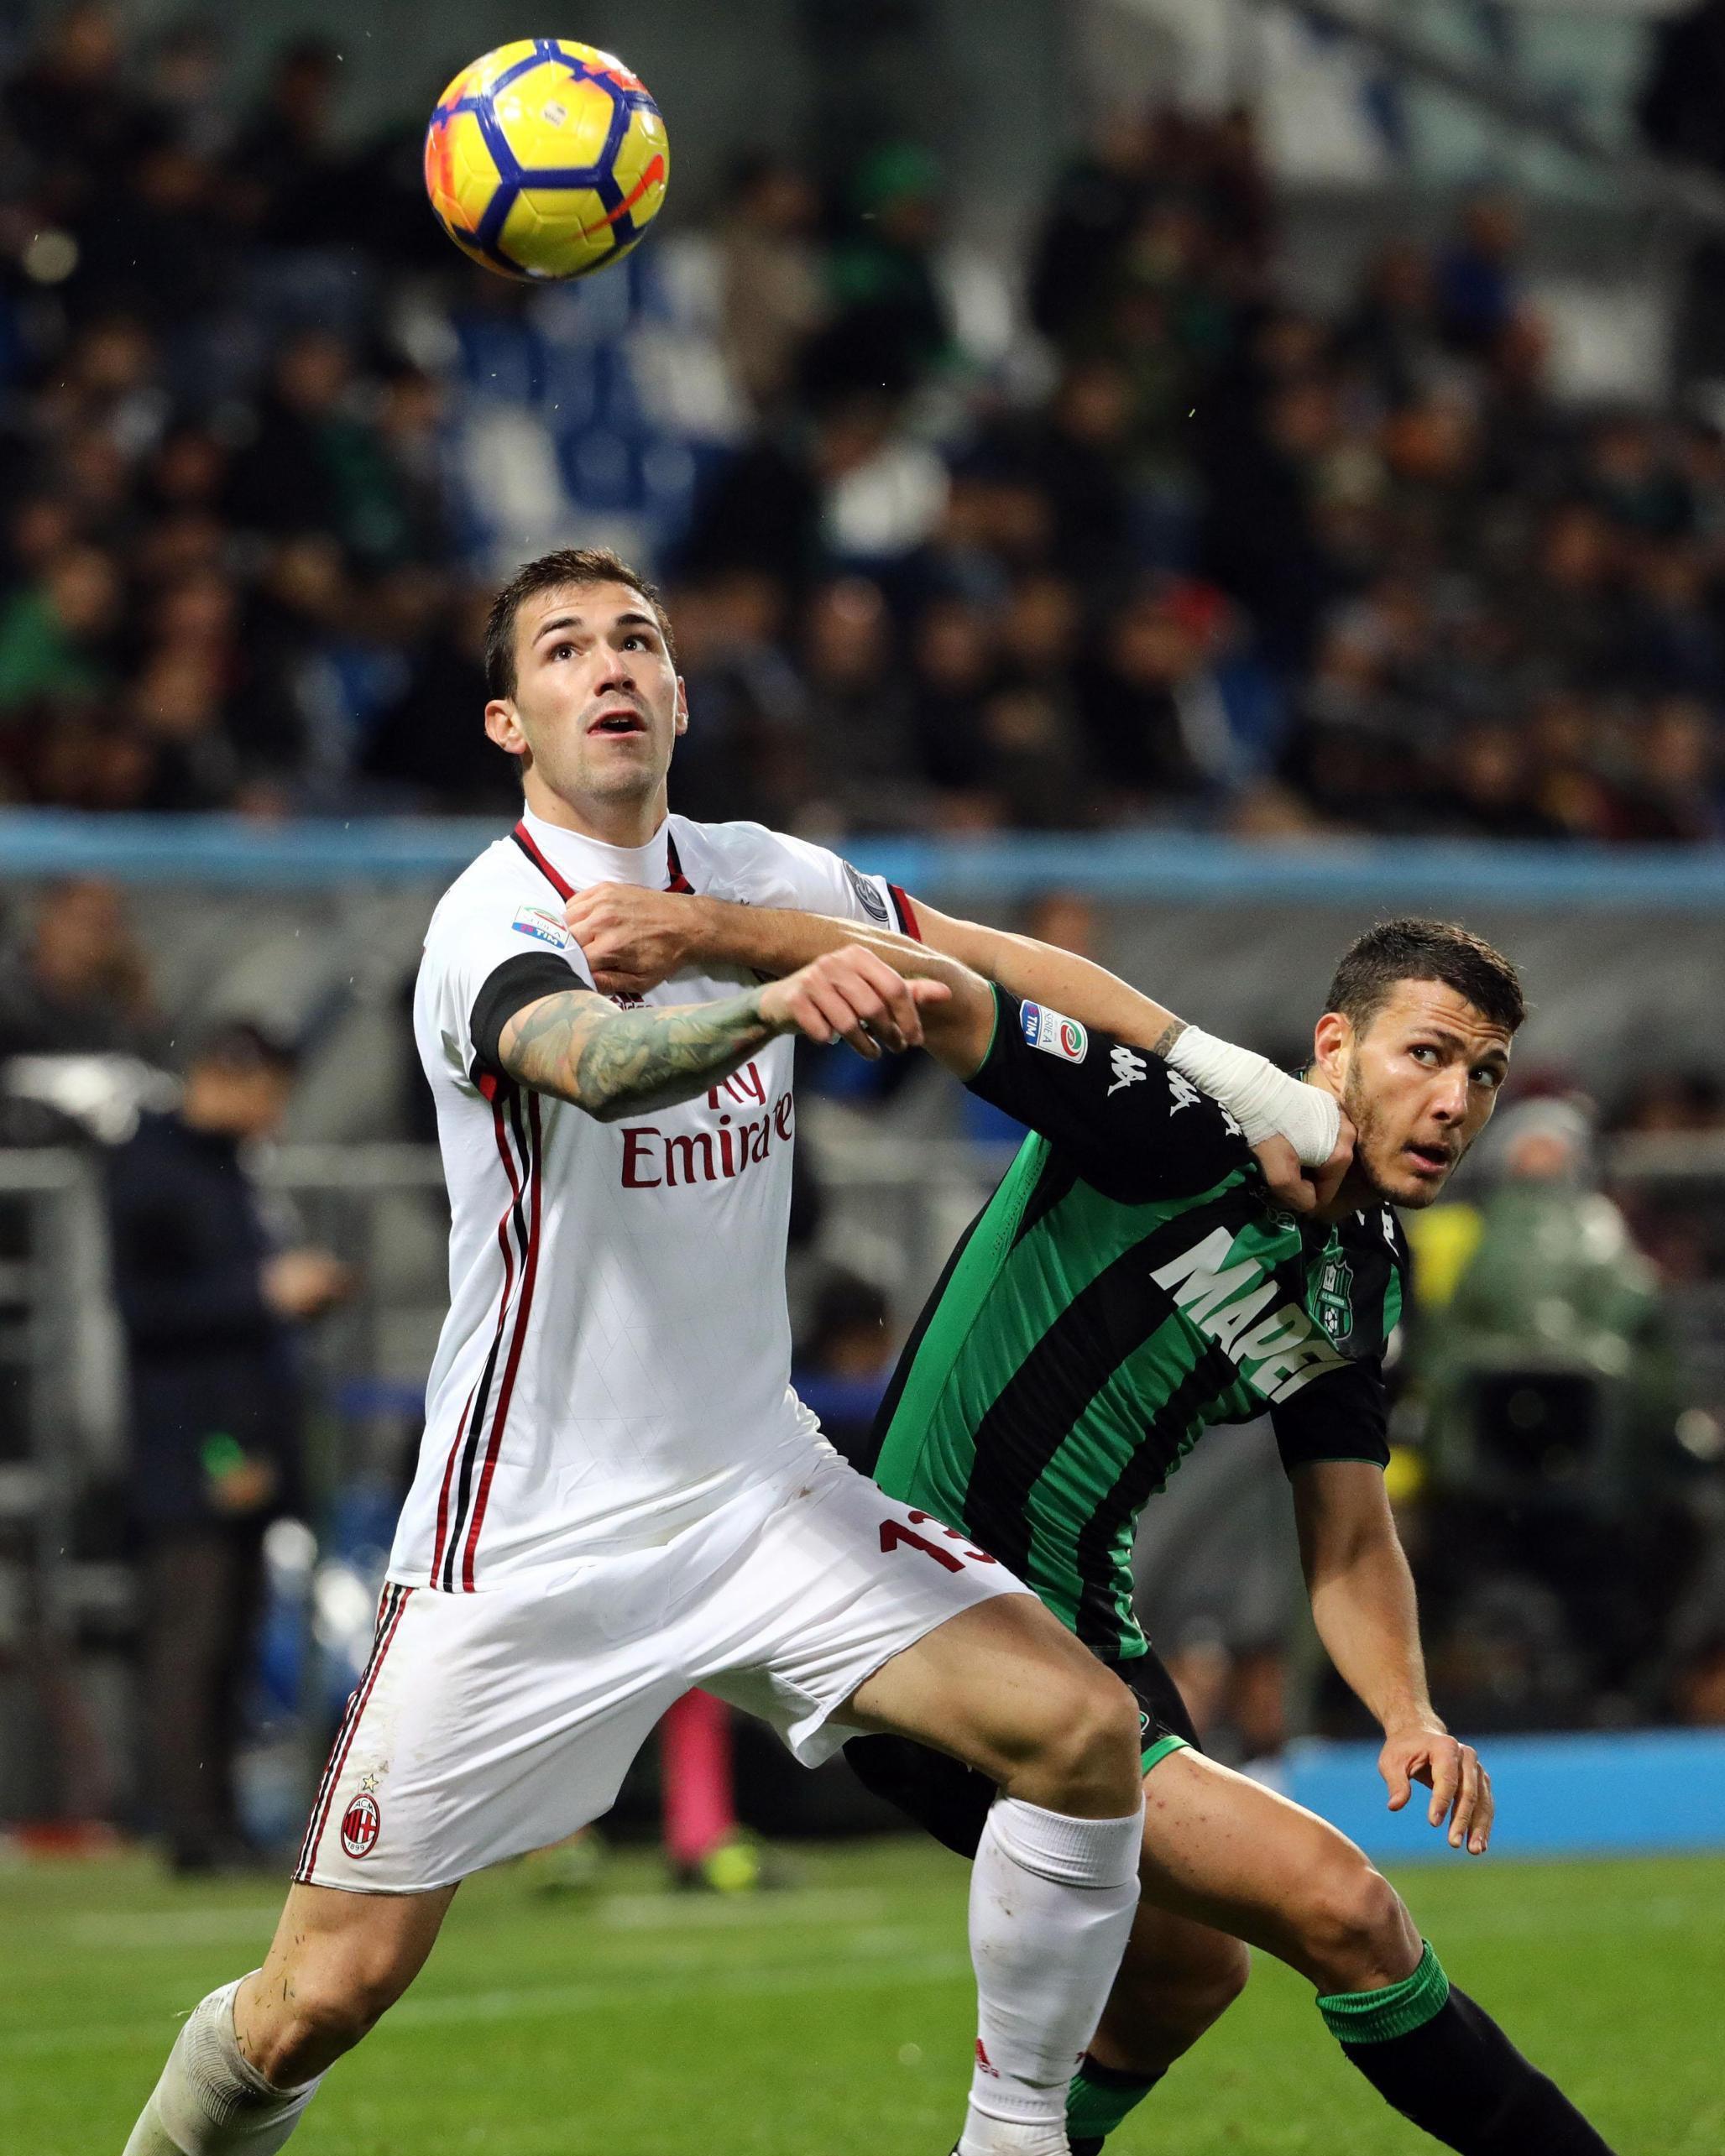 Alessio Romagnoli saat beraksi bagi AC Milan. (Elisabetta Baracchi/ANSA via AP)